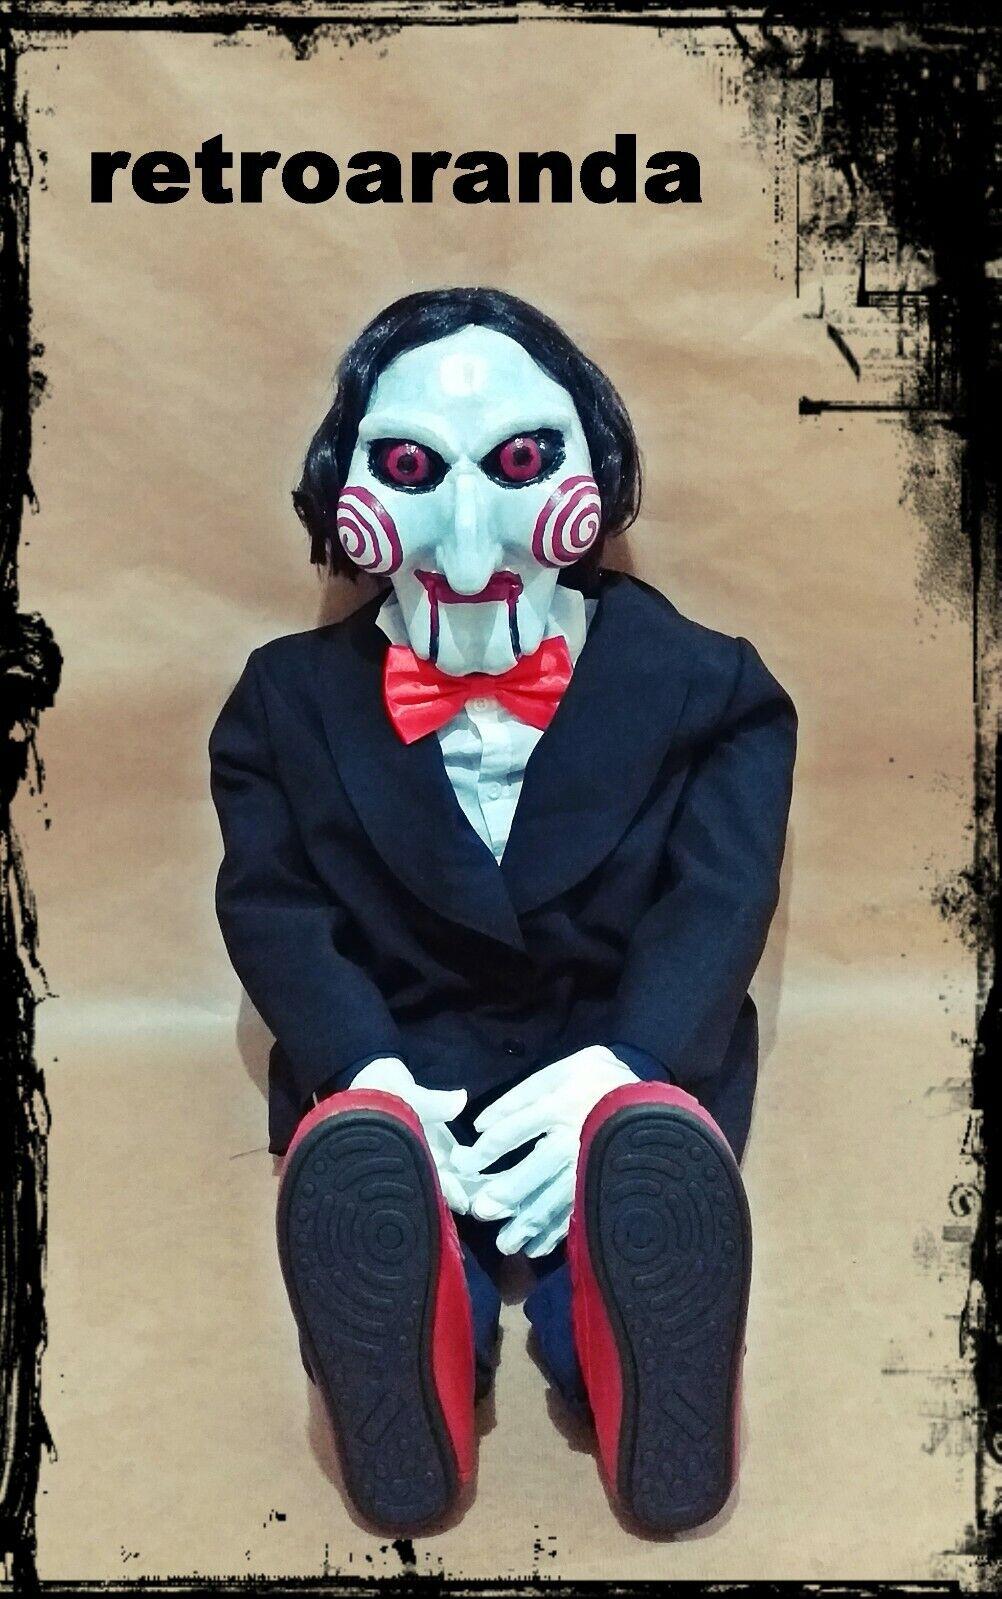 Muñeco Billy - Personaje de la pelicula saw